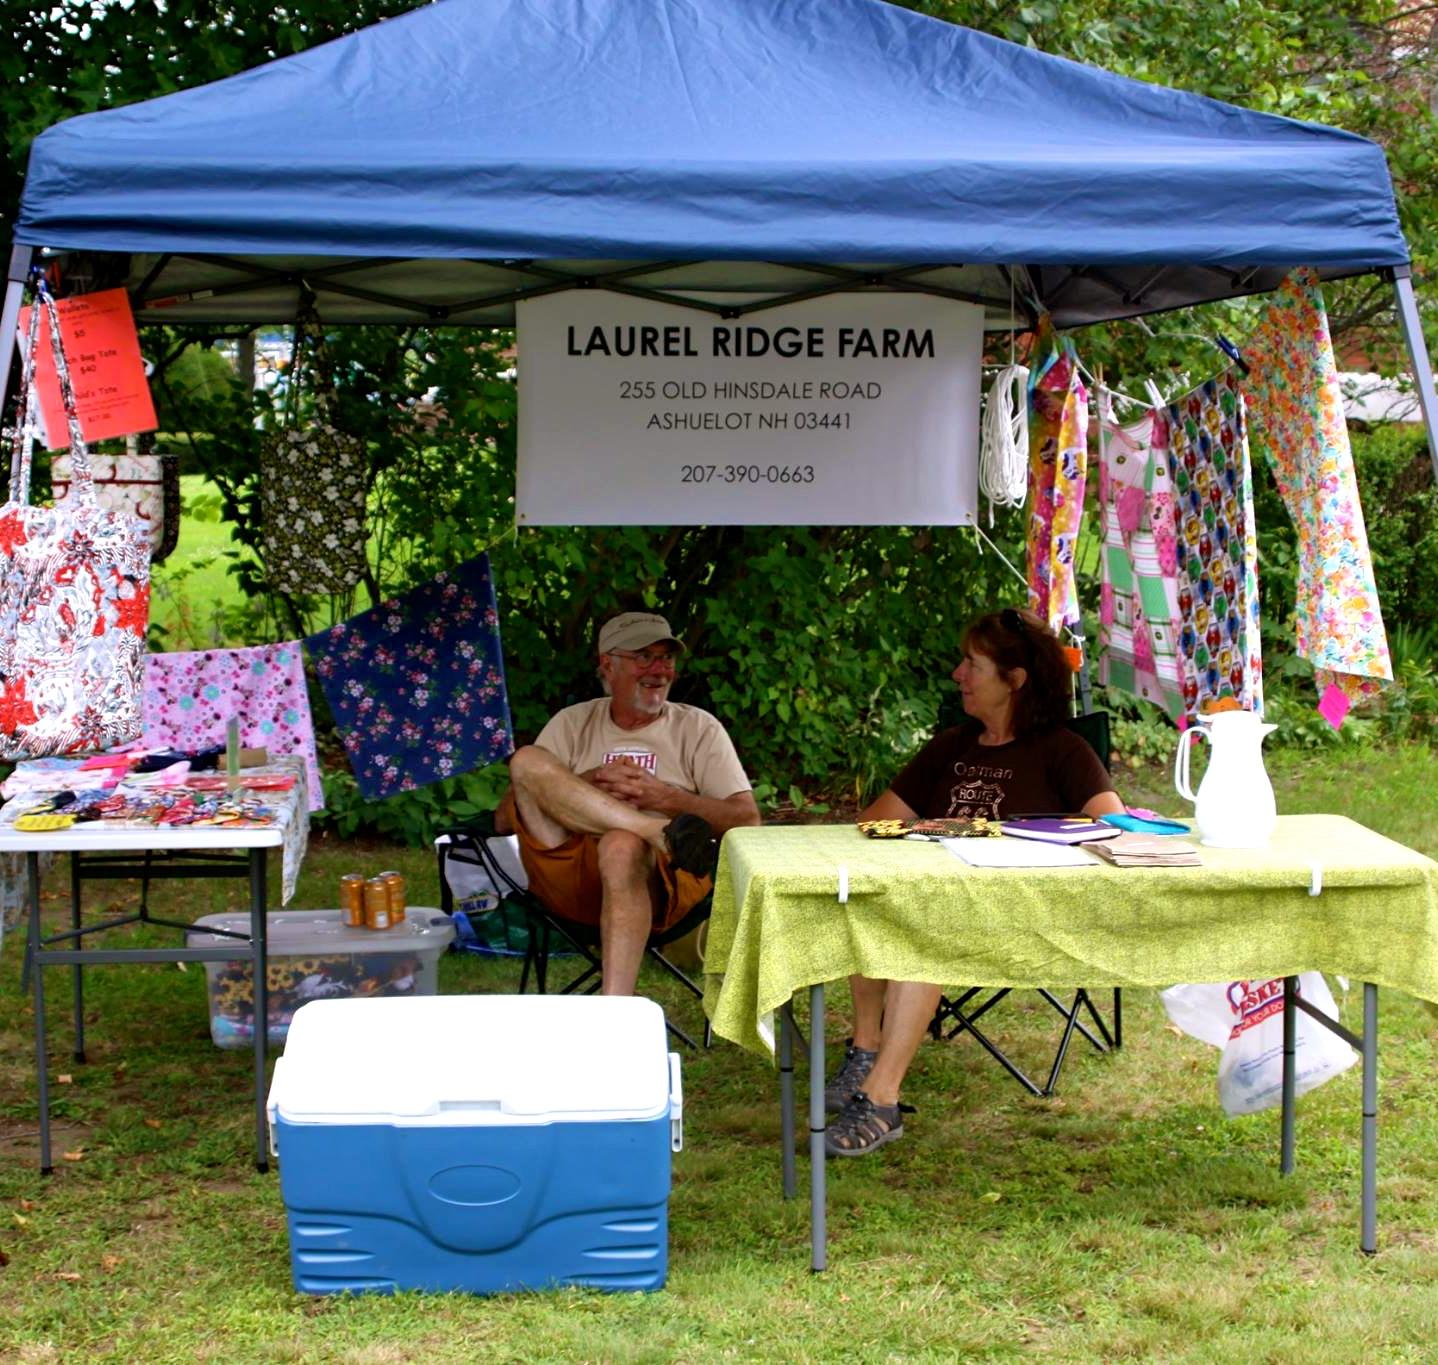 Laurel Ridge Farm - Rob & Rebecca Moulton